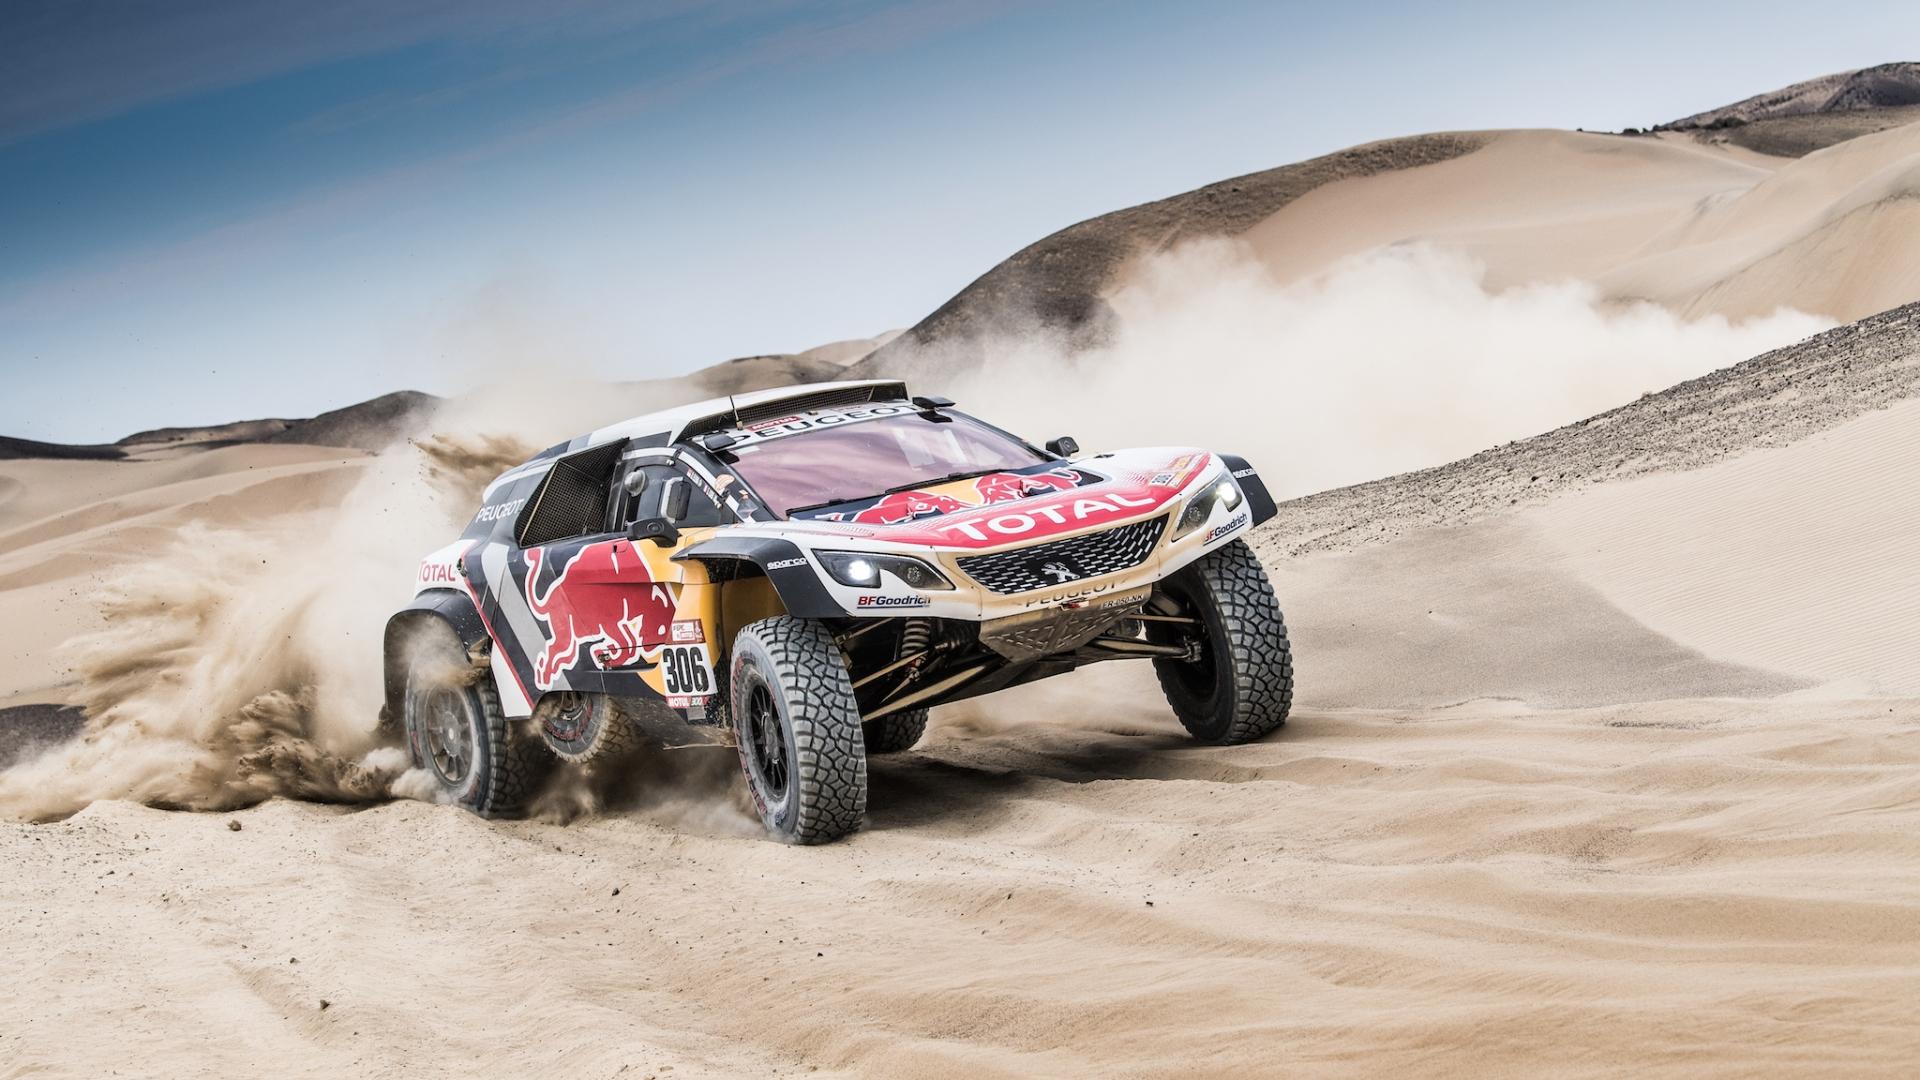 Peugeot team Dakar 2018 - 1920x1080